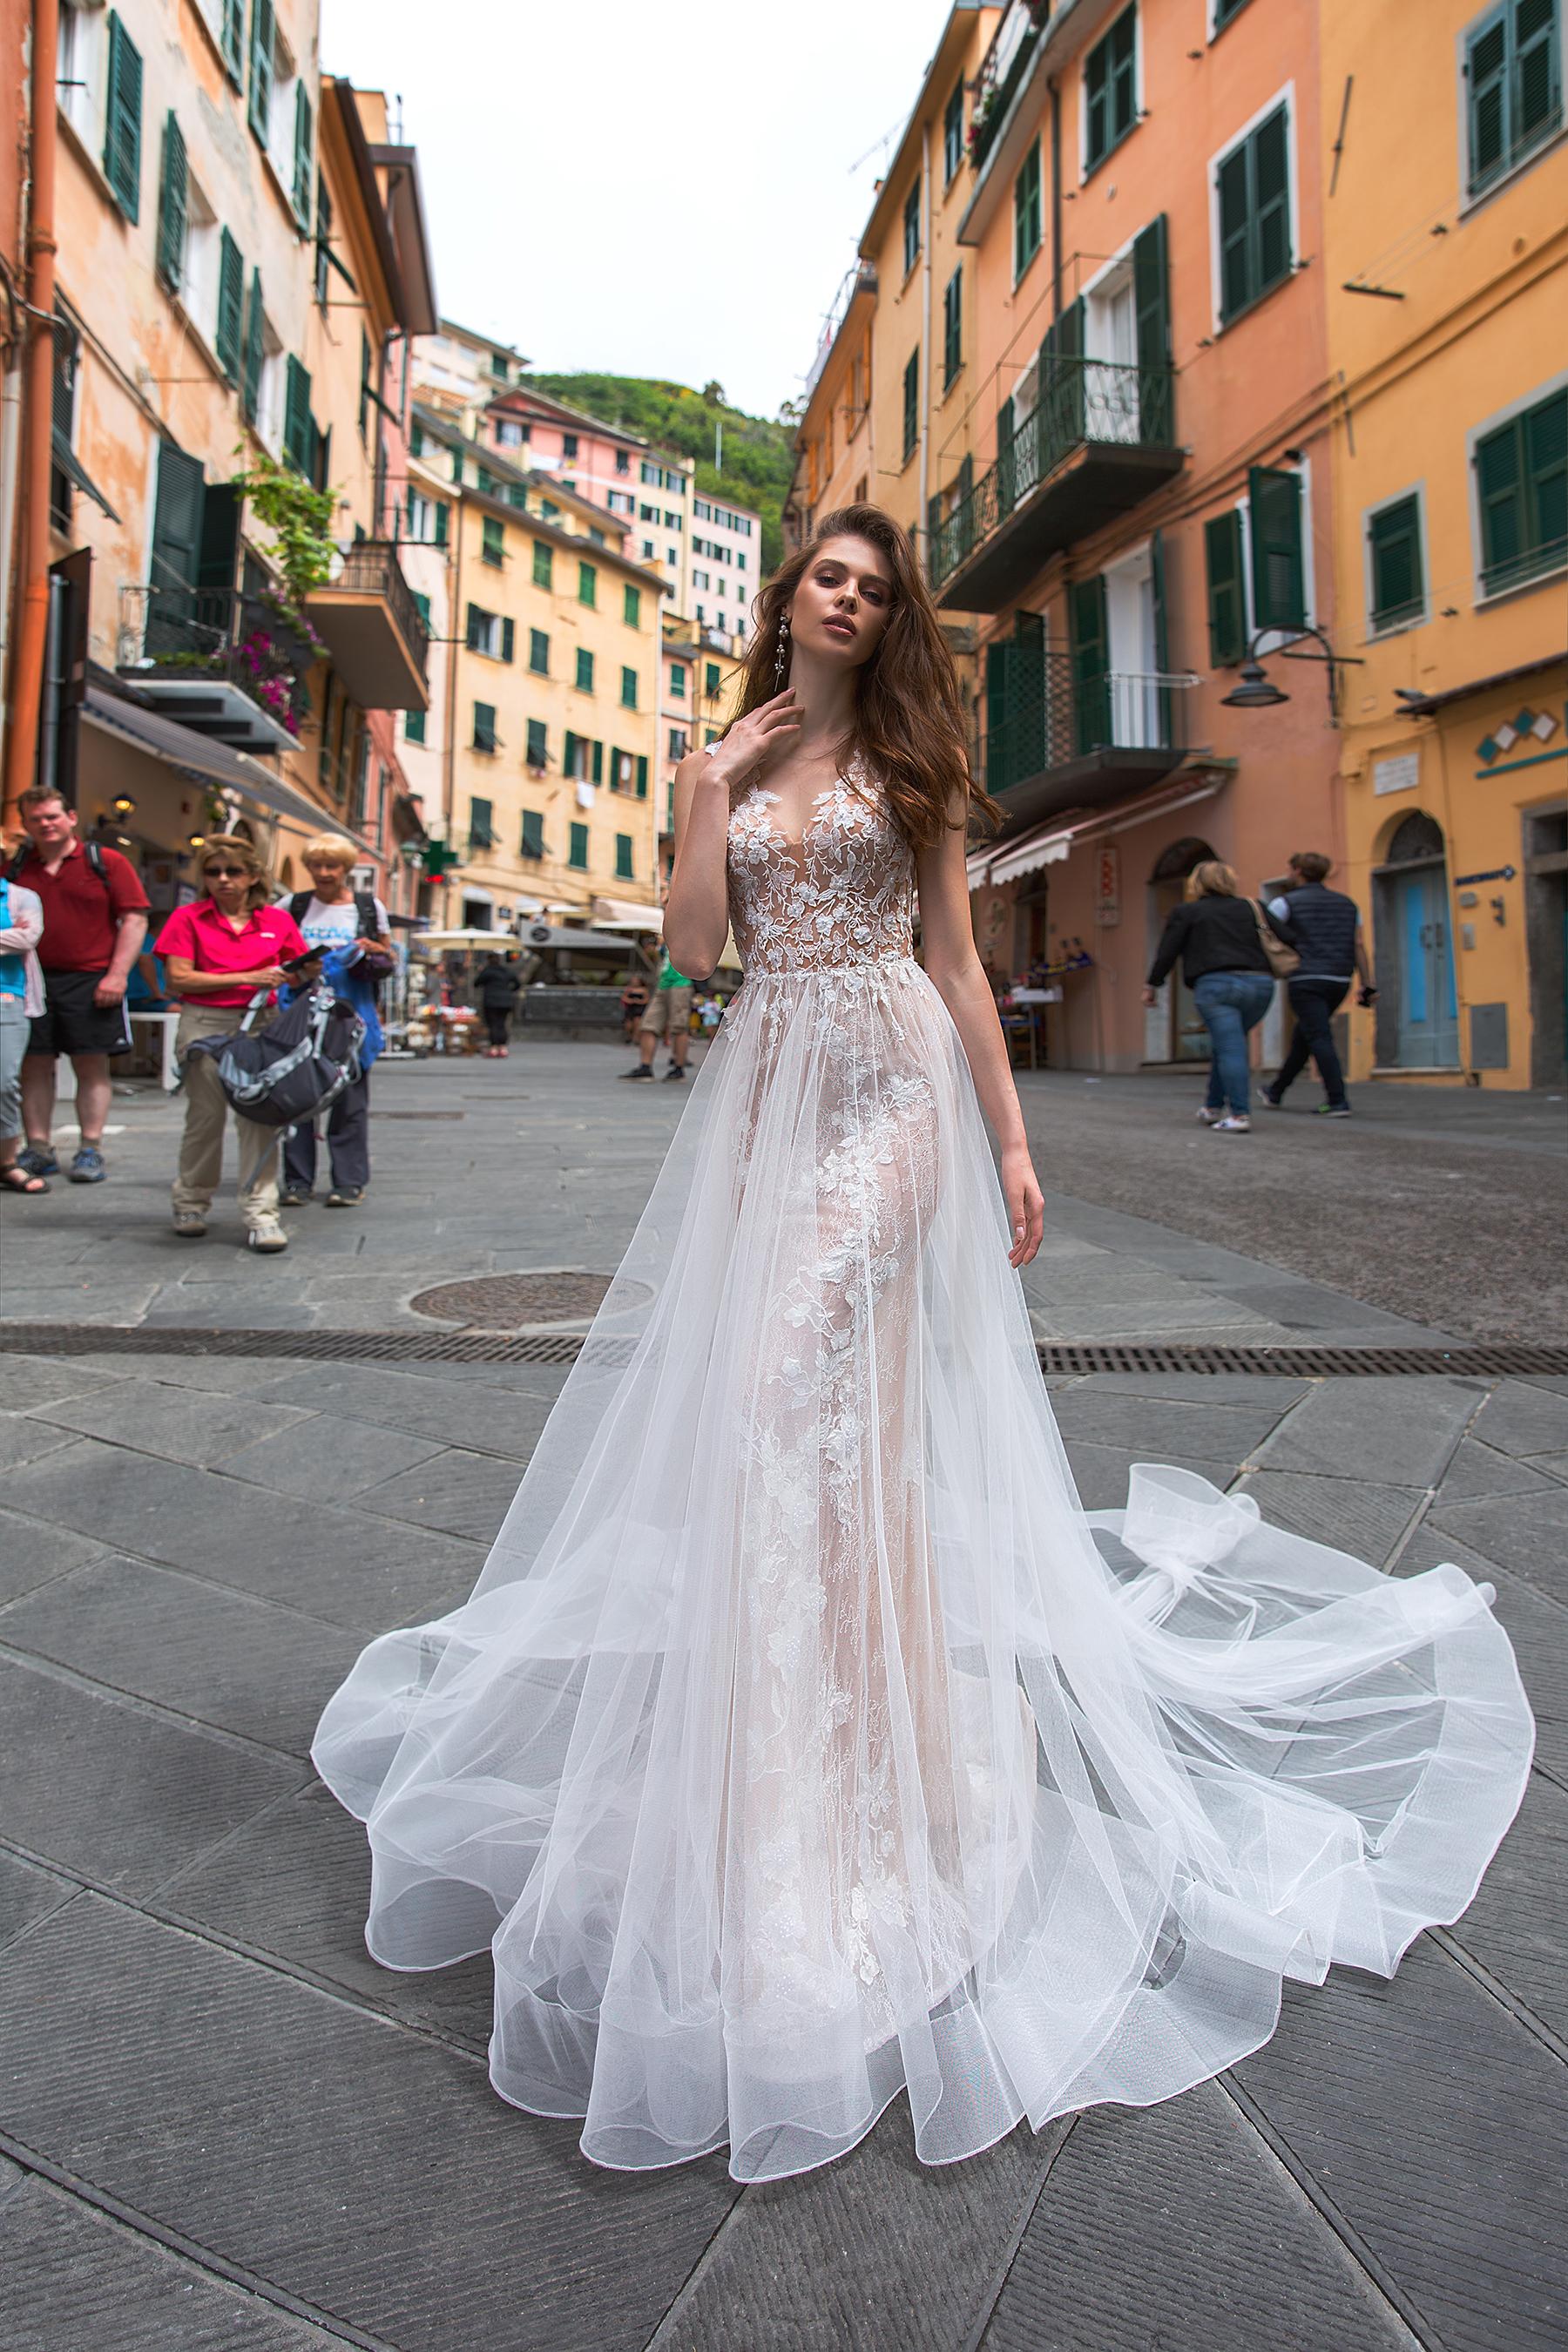 Rochie De Mireasa Merion Sposa Dell Amore Rochii De Mireasa Bucuresti